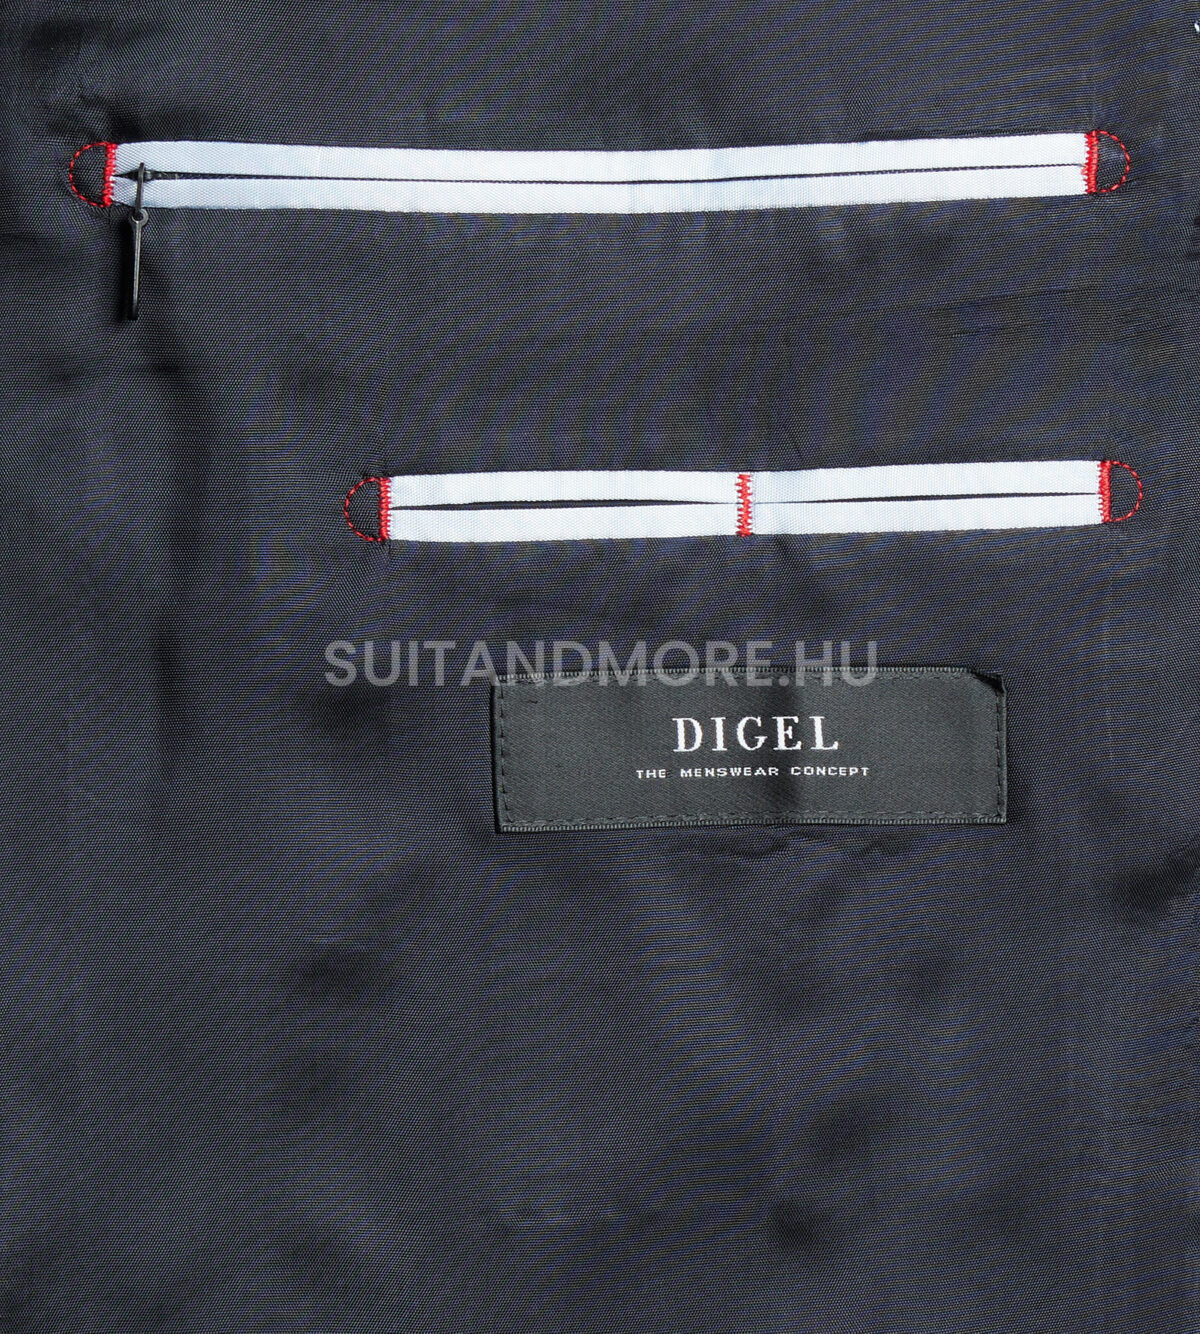 digel-protect3-sotetkek-modern-fit-gyapju-kevert-oltony-damian-amf-per-v-99601-24